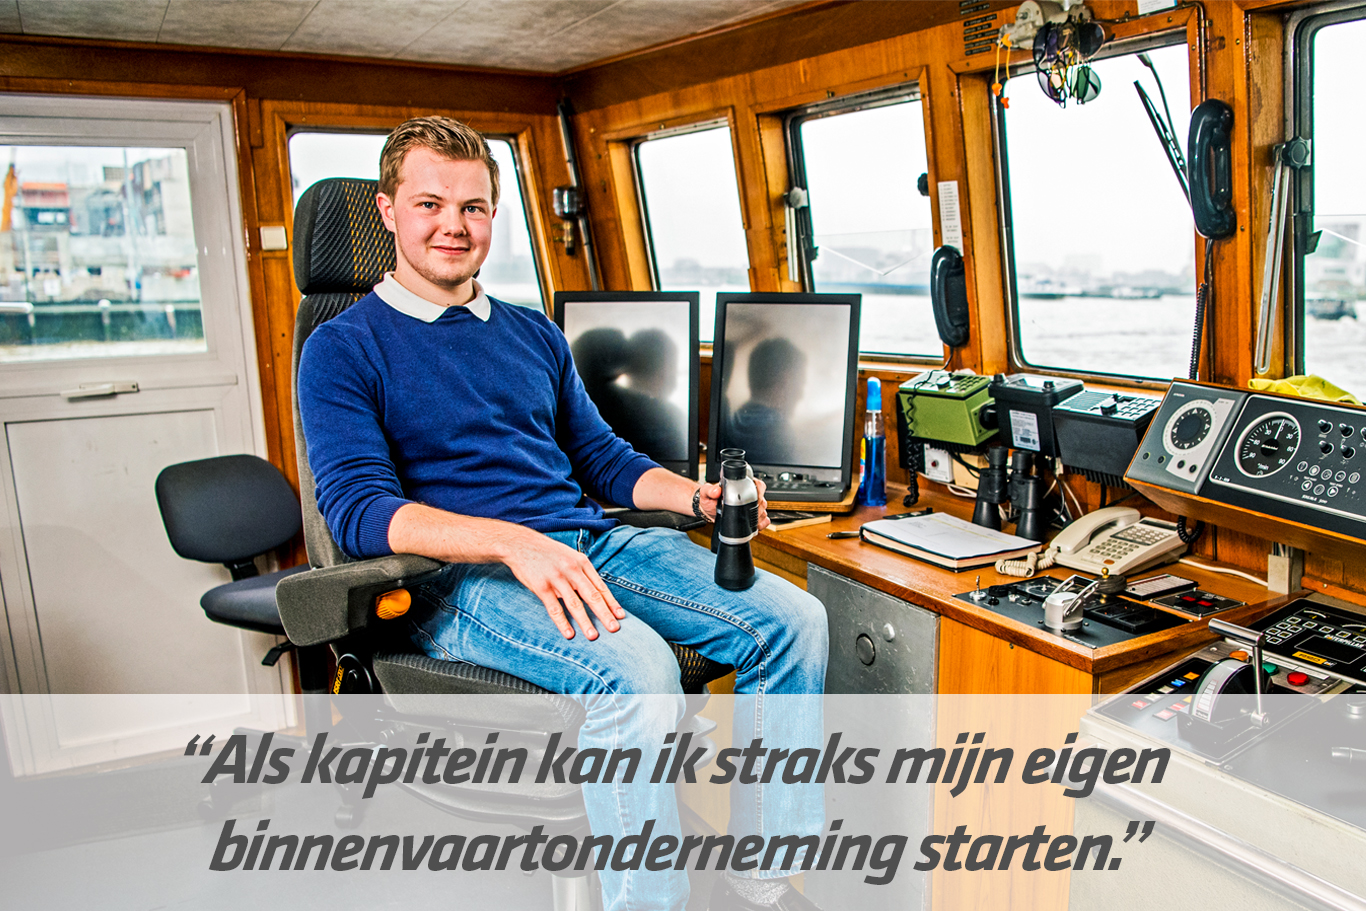 Mbo-opleiding Kapitein binnenvaart | STC mbo college Rotterdam